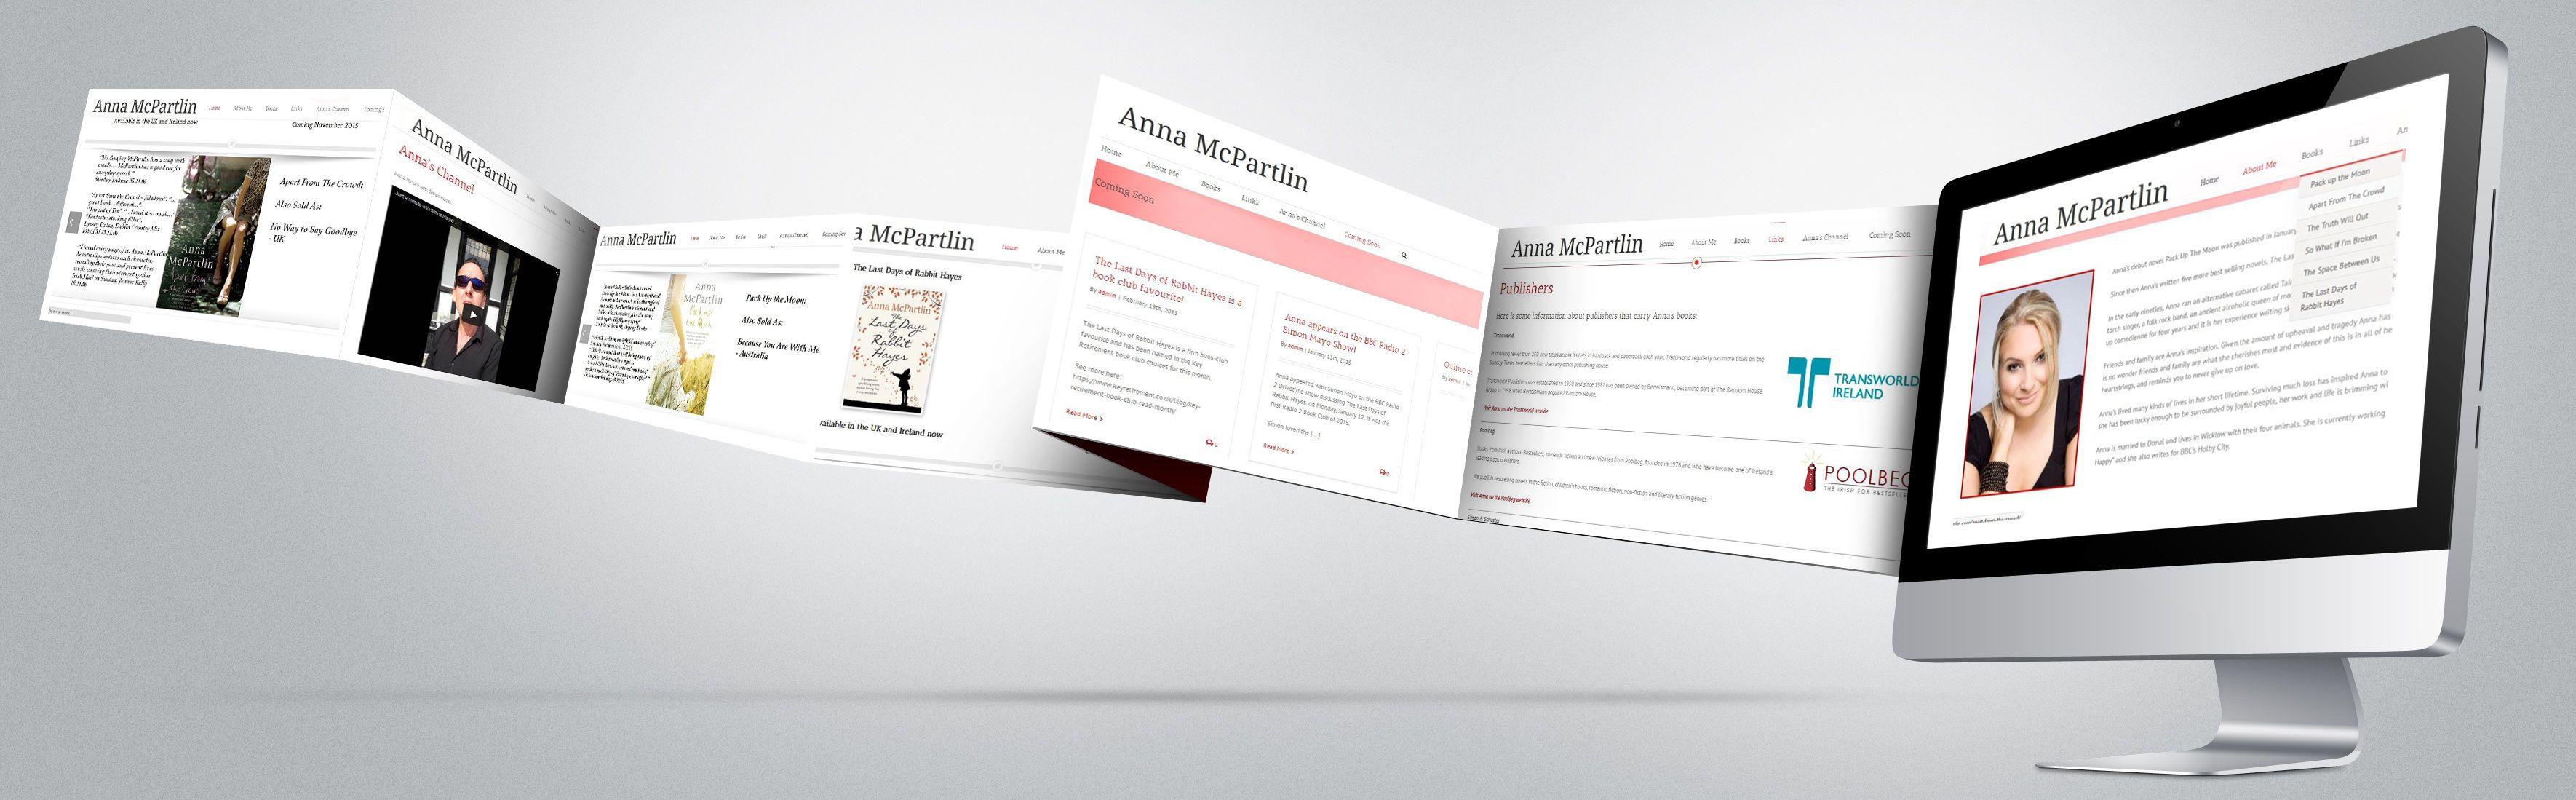 WebMockup-AnnaMcPartlin-2